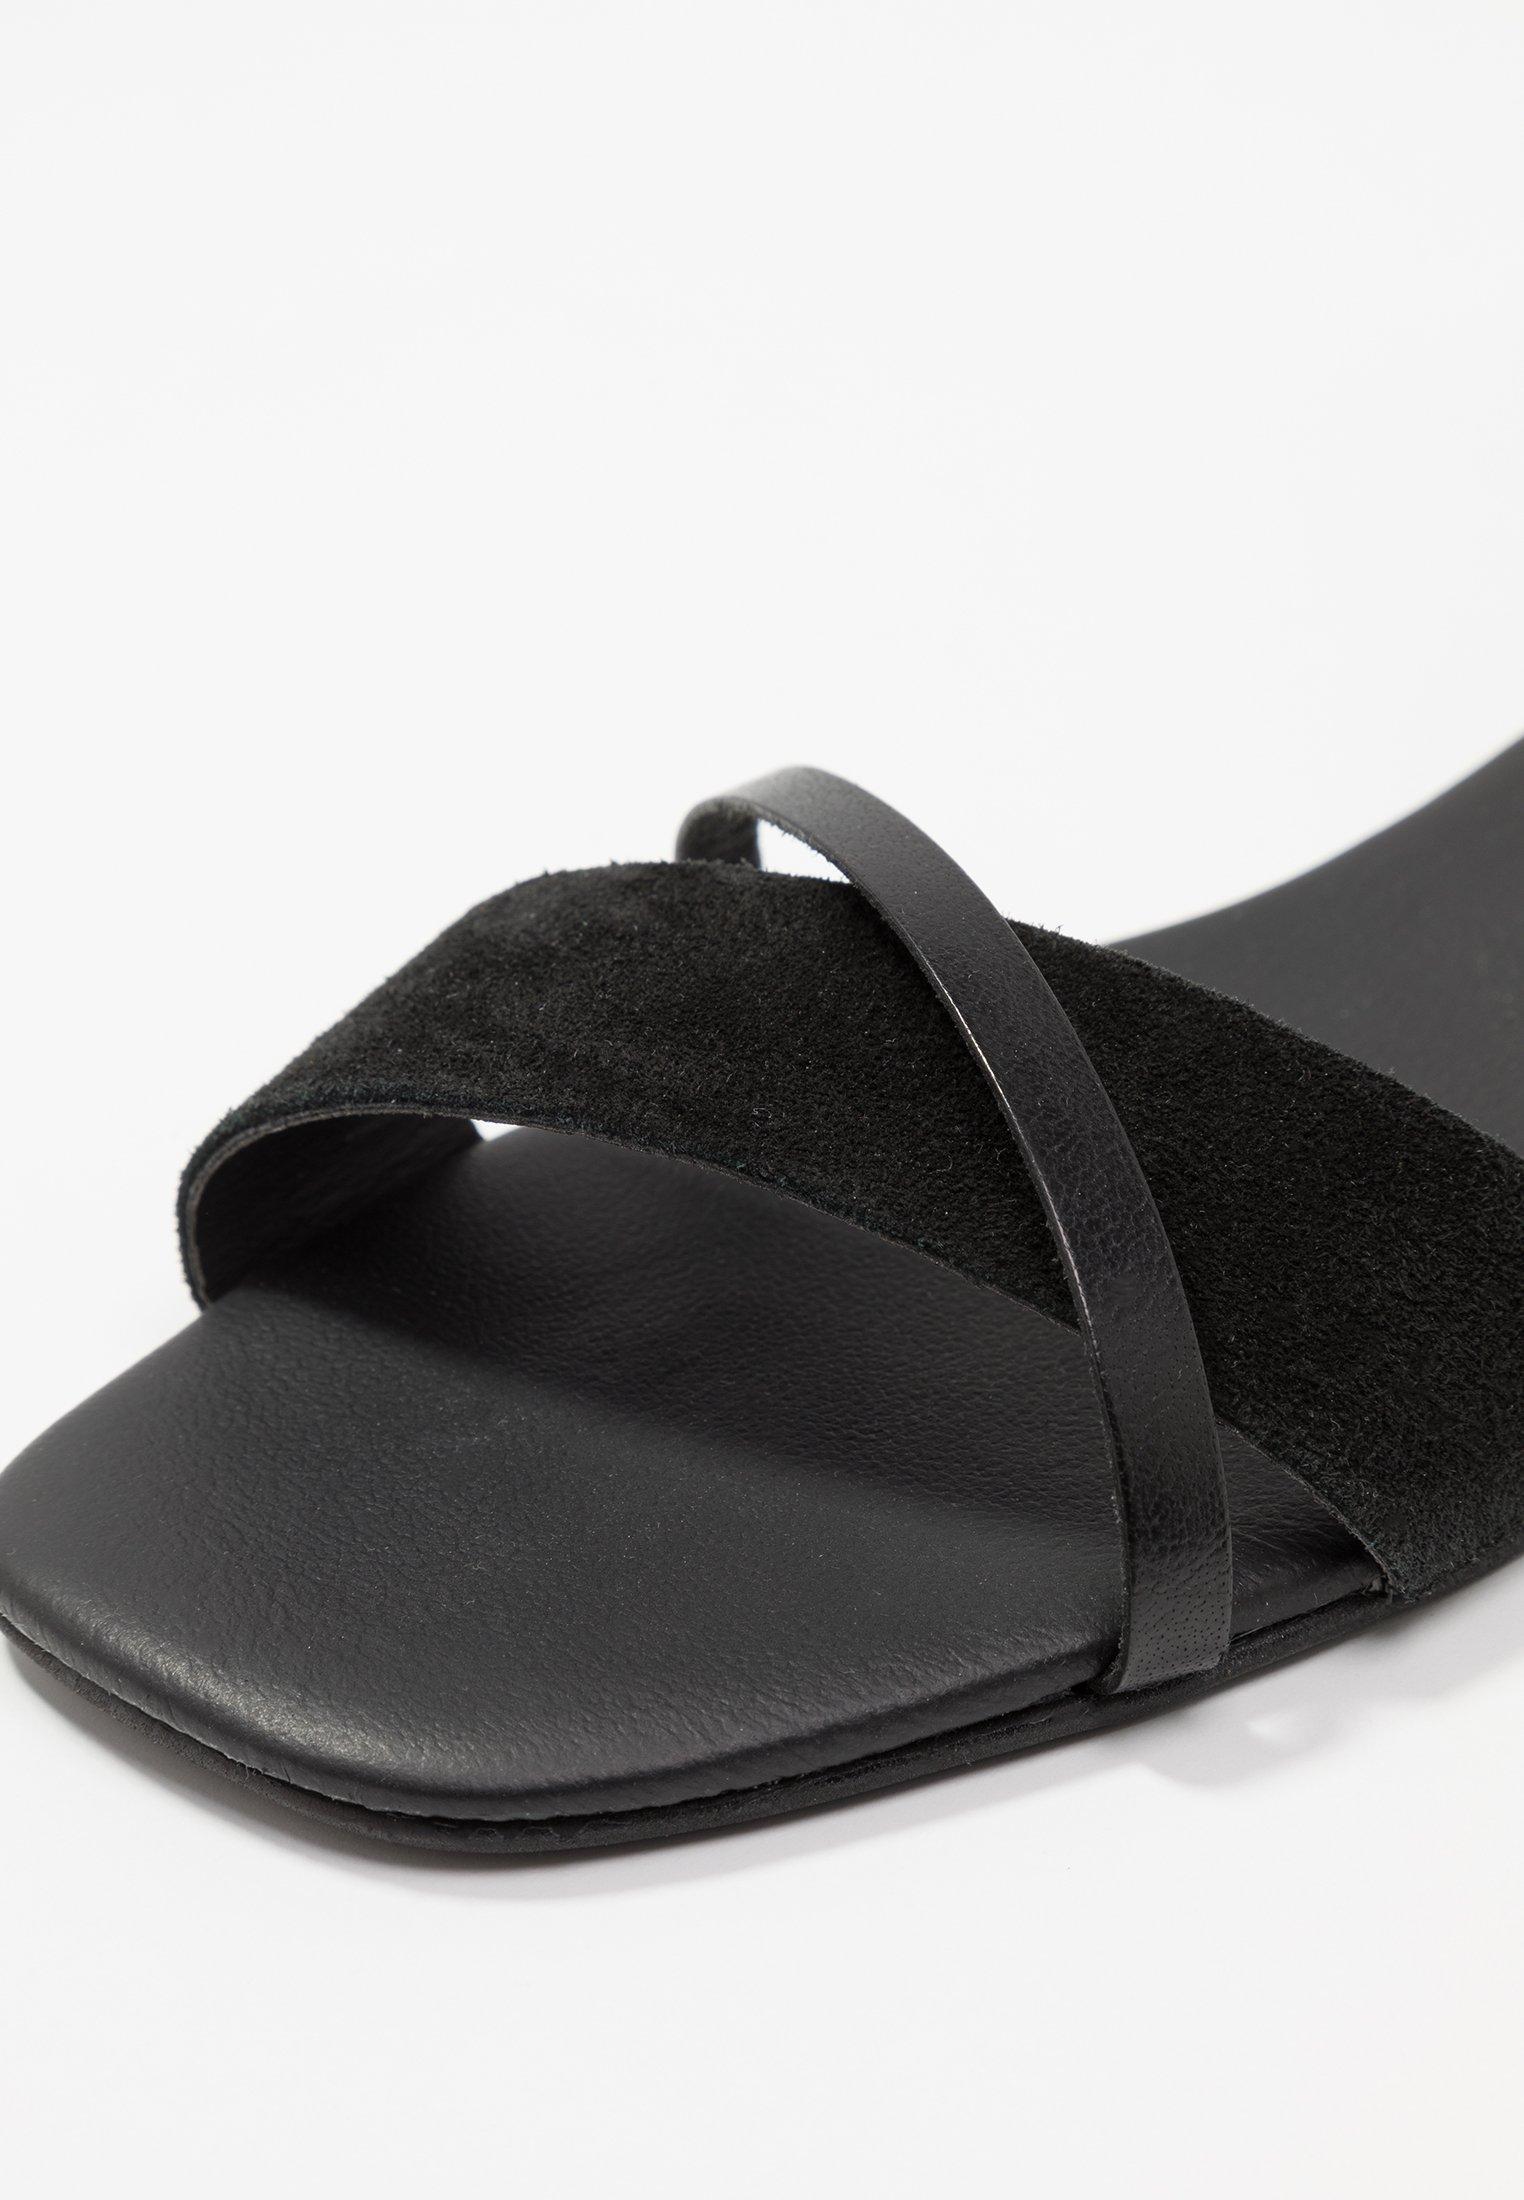 SandalesBlack SandalesBlack Zign SandalesBlack SandalesBlack Zign Zign Zign EDW9YH2I